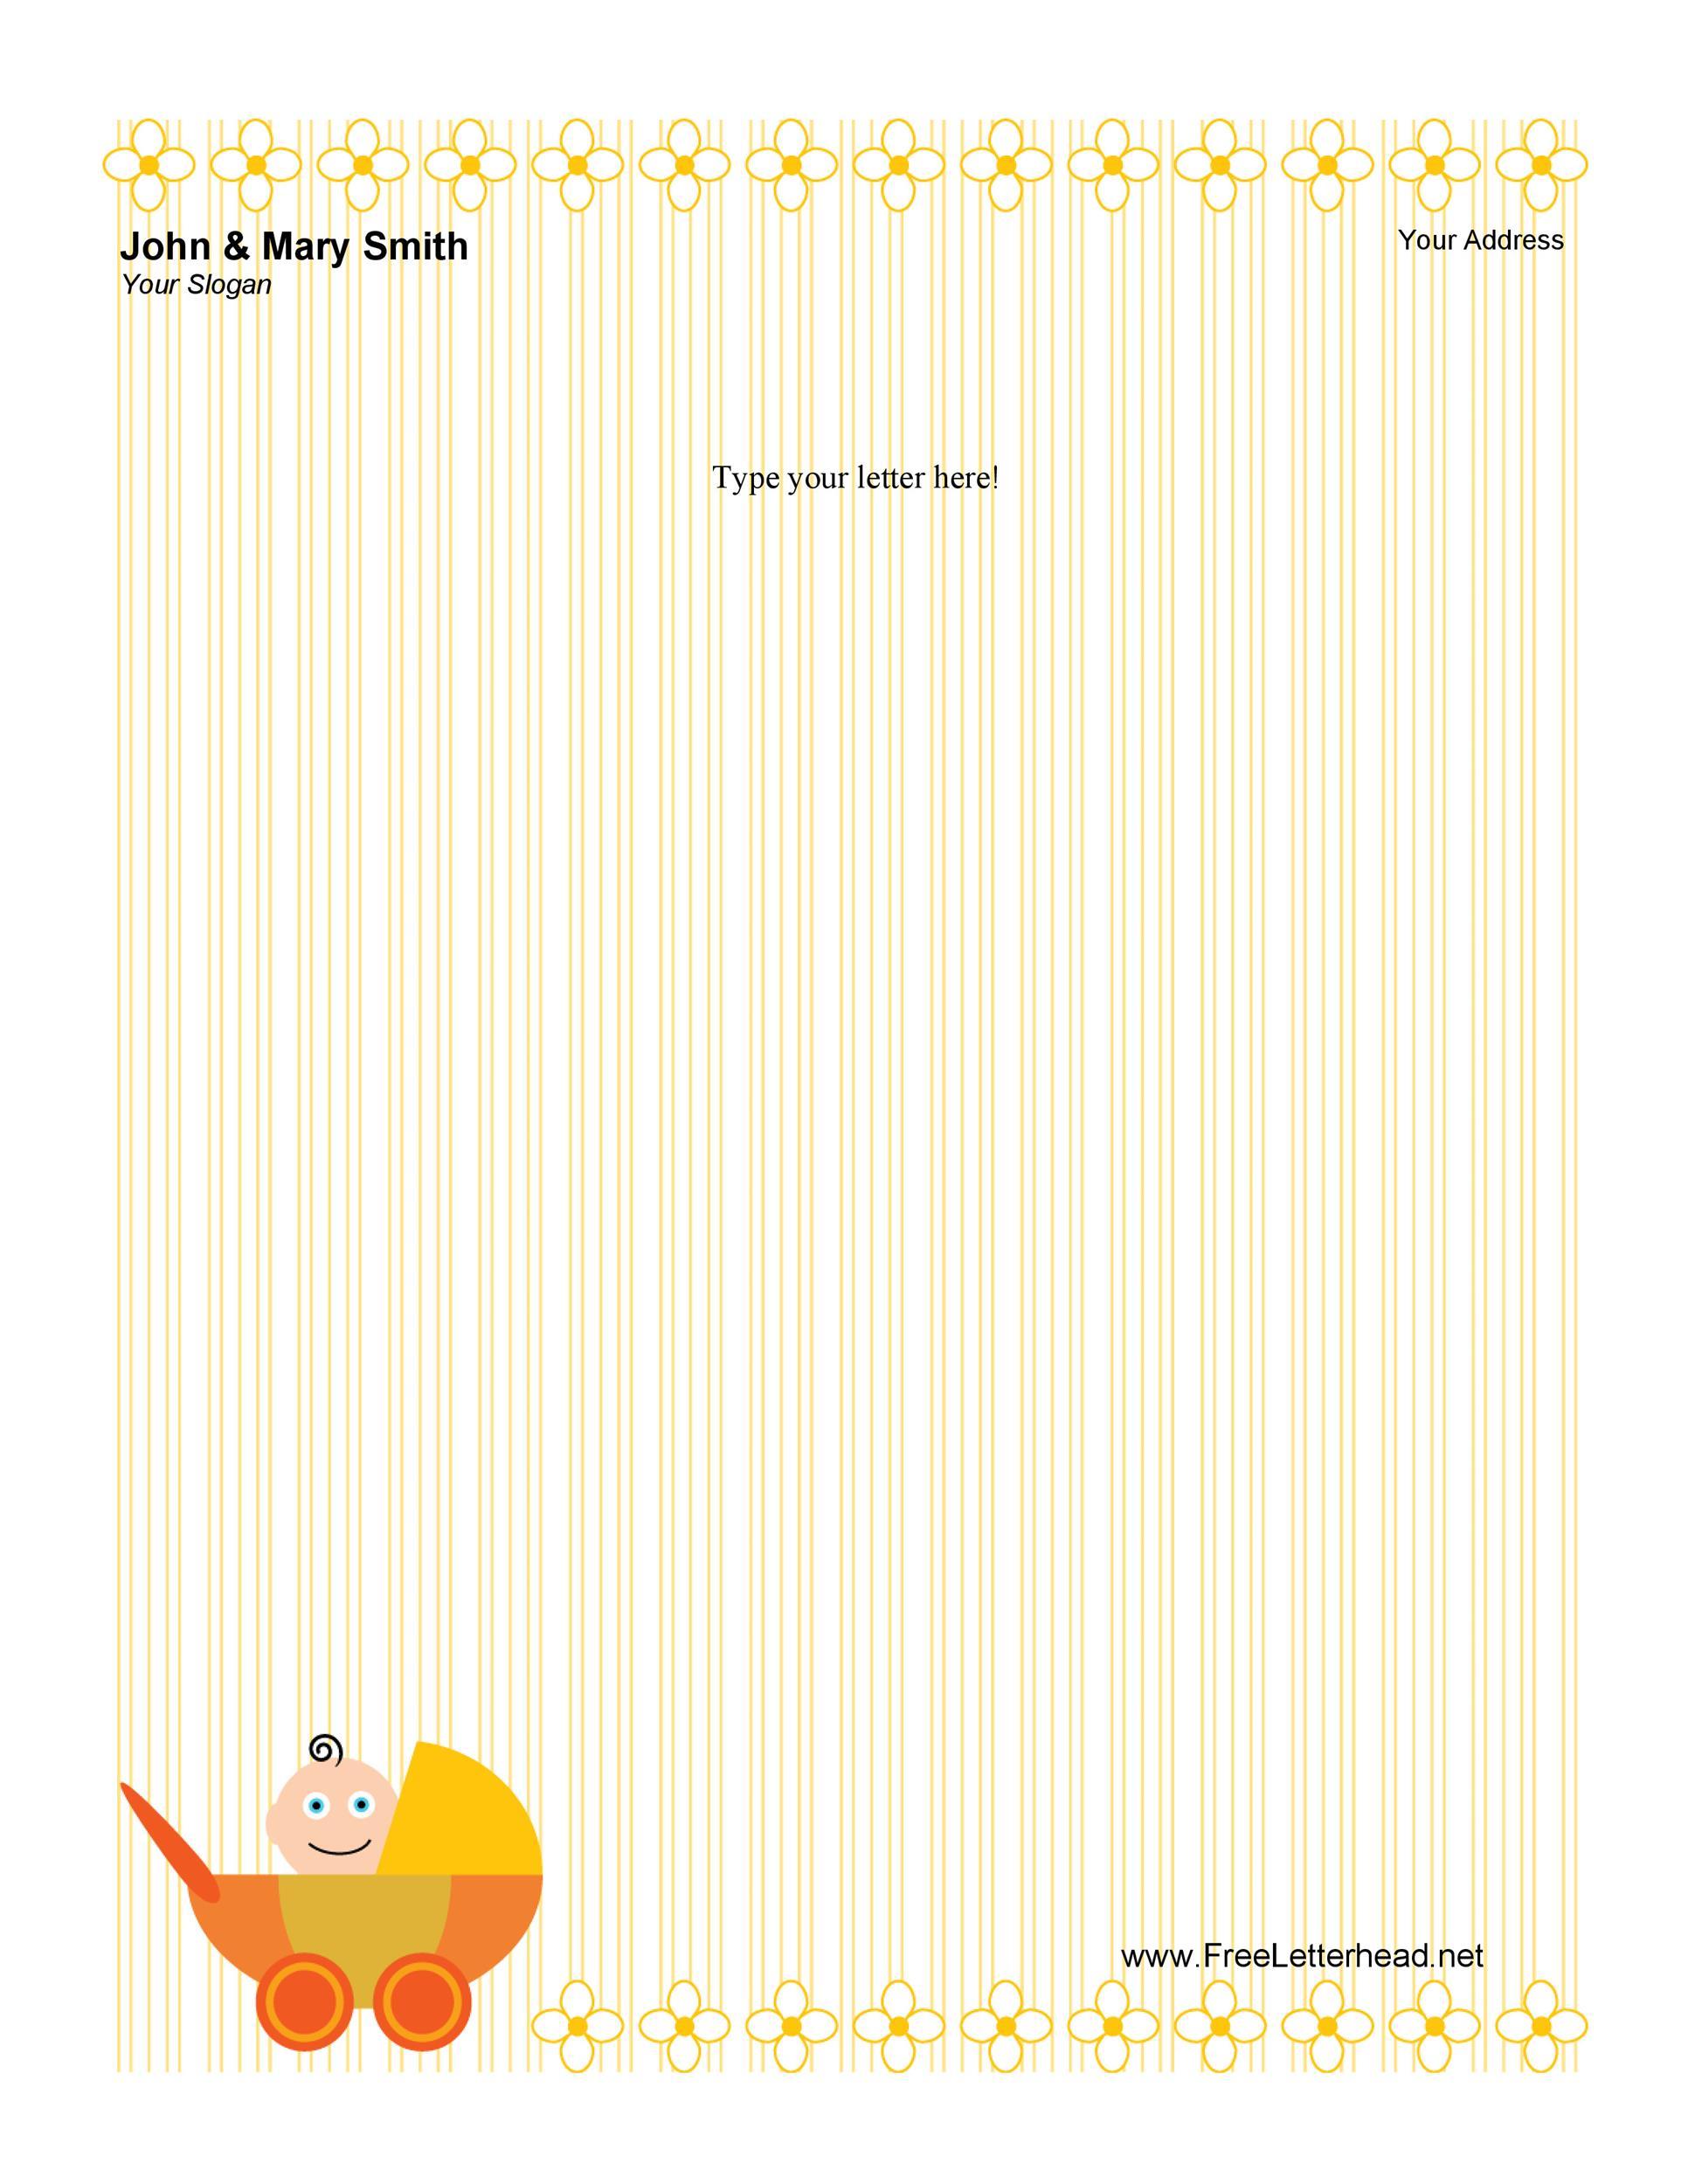 Free Letterhead Template 33